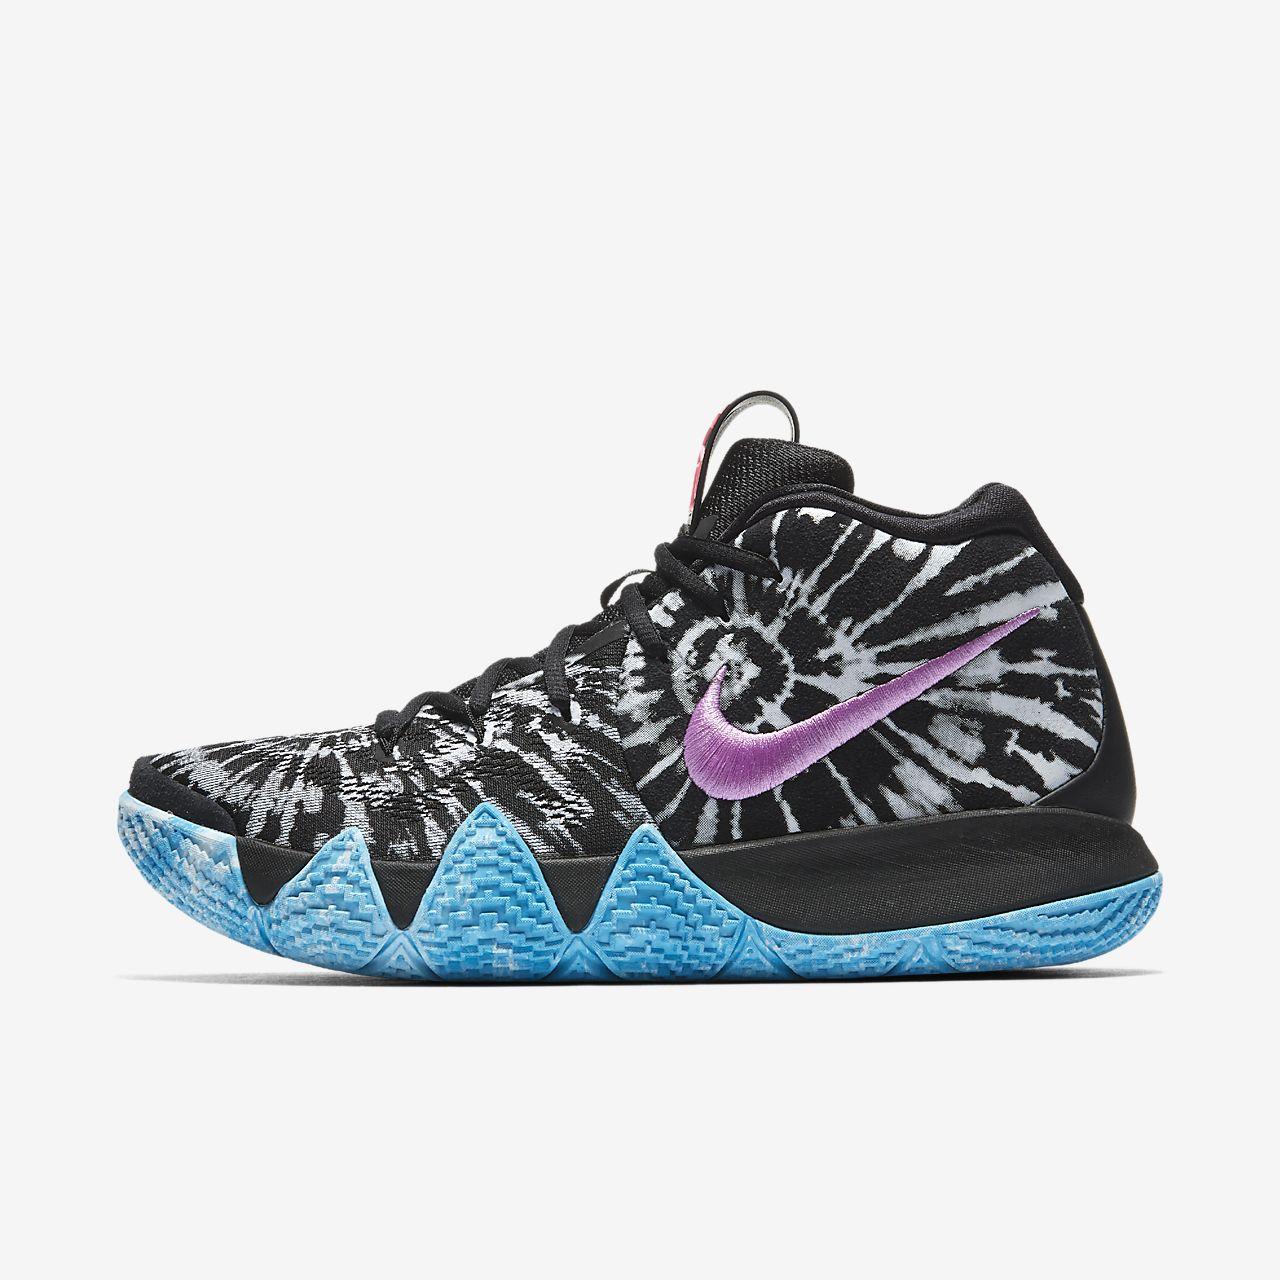 Kyrie 4 AS 男款籃球鞋